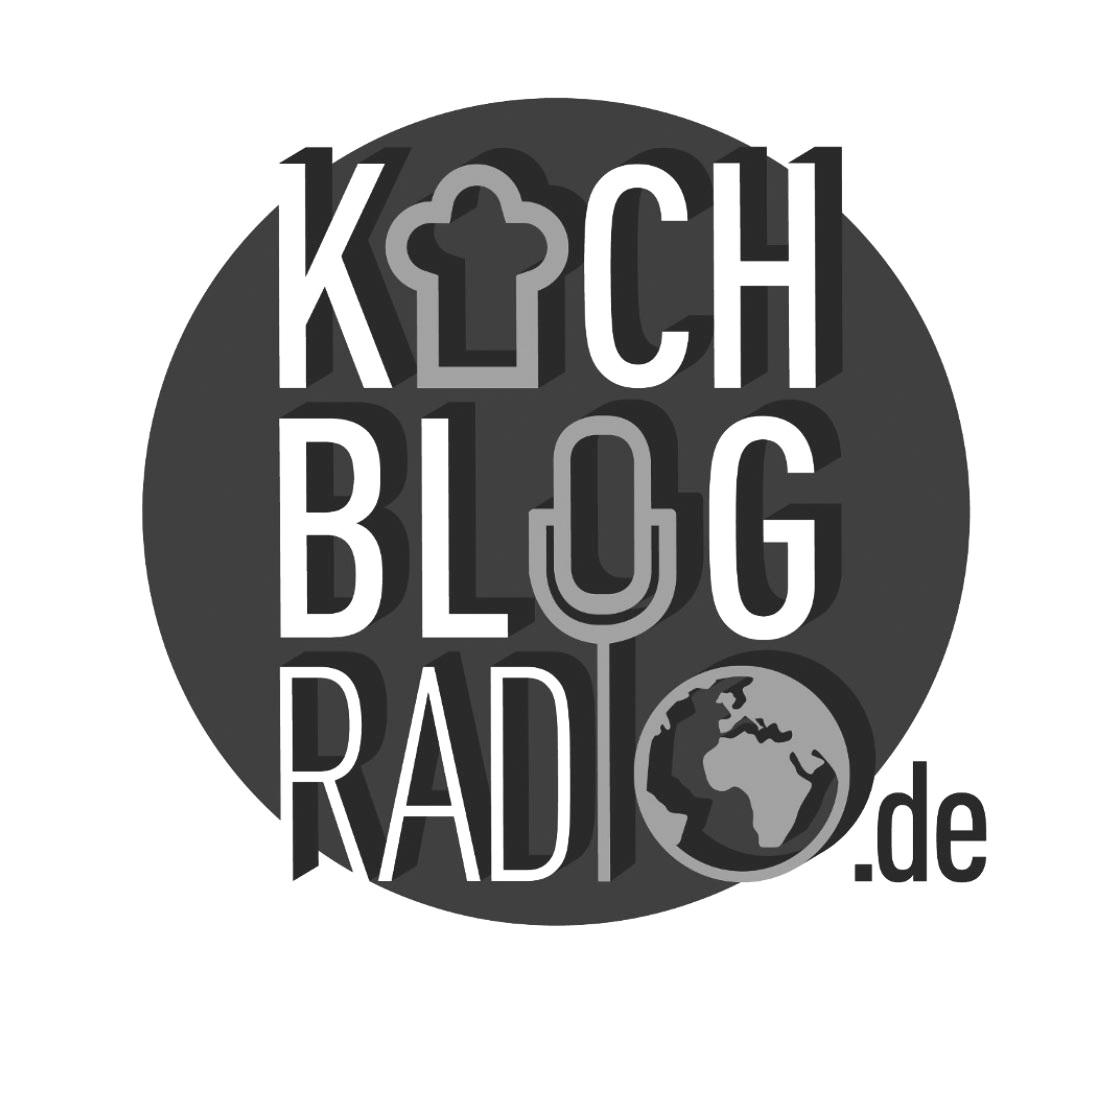 kochblogradio_logo_sw.jpg